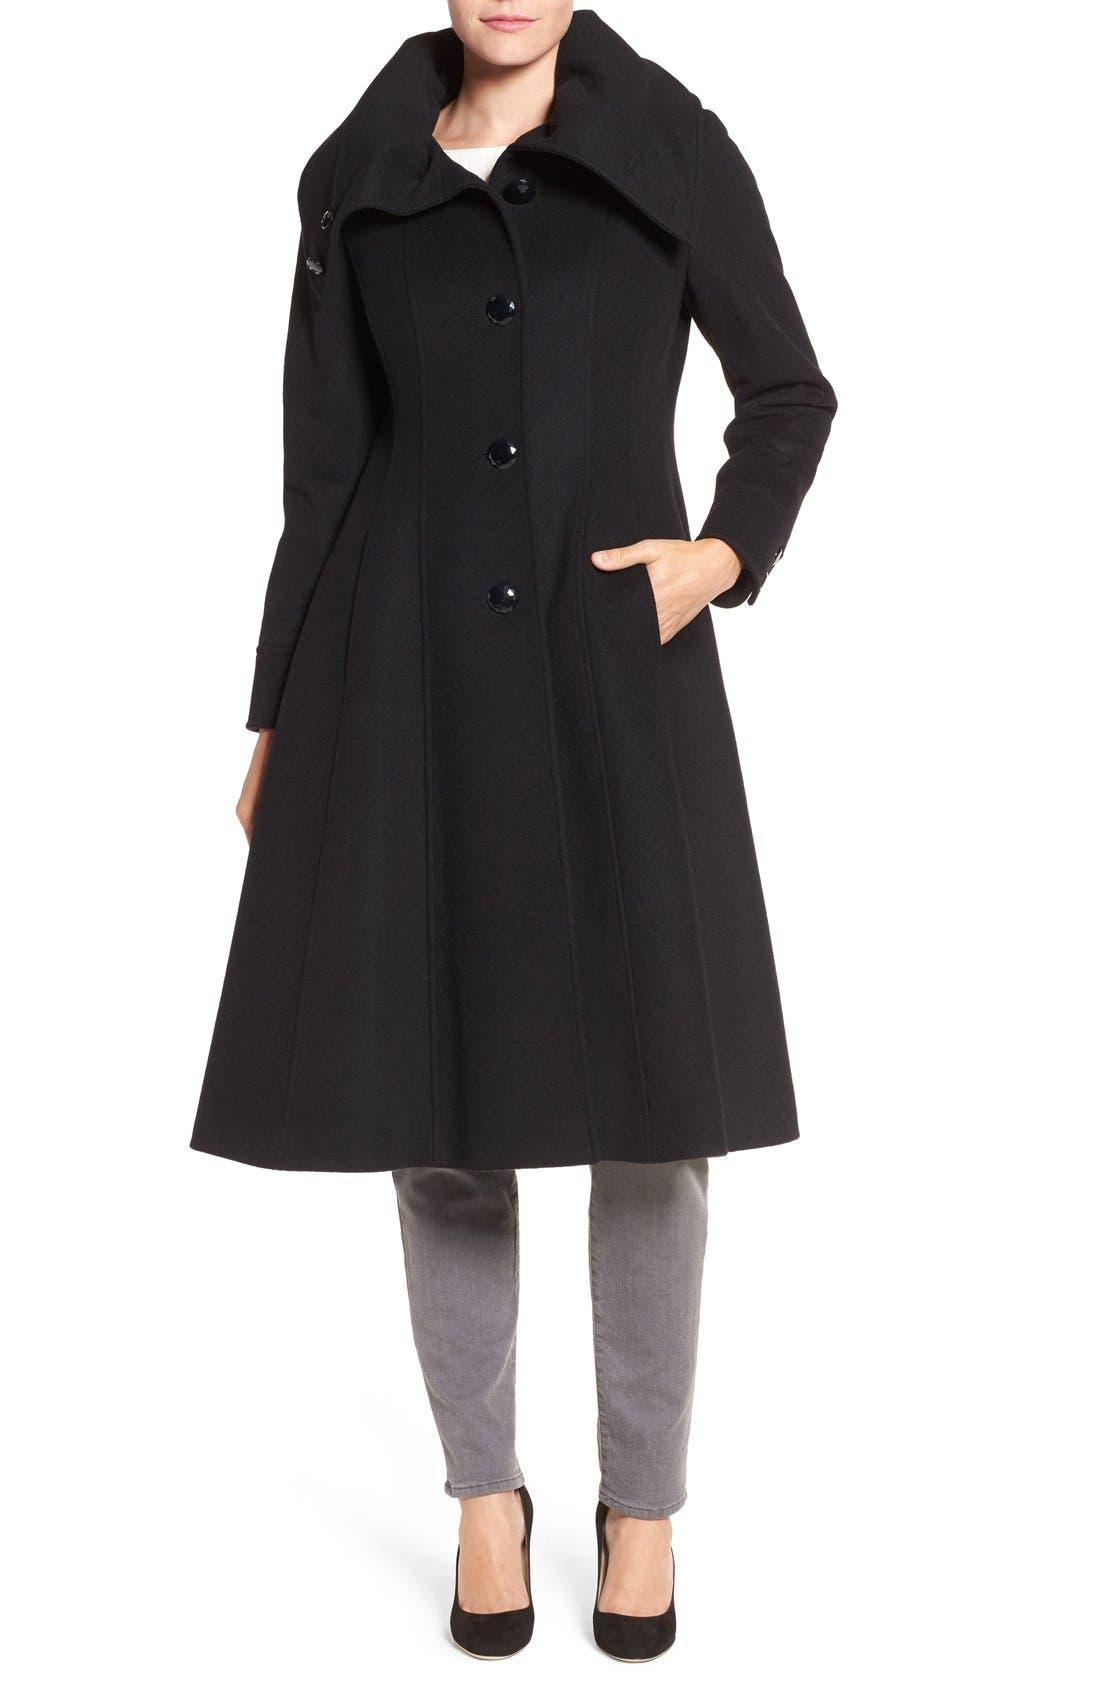 George Simonton High Neck Wool Blend Long Coat